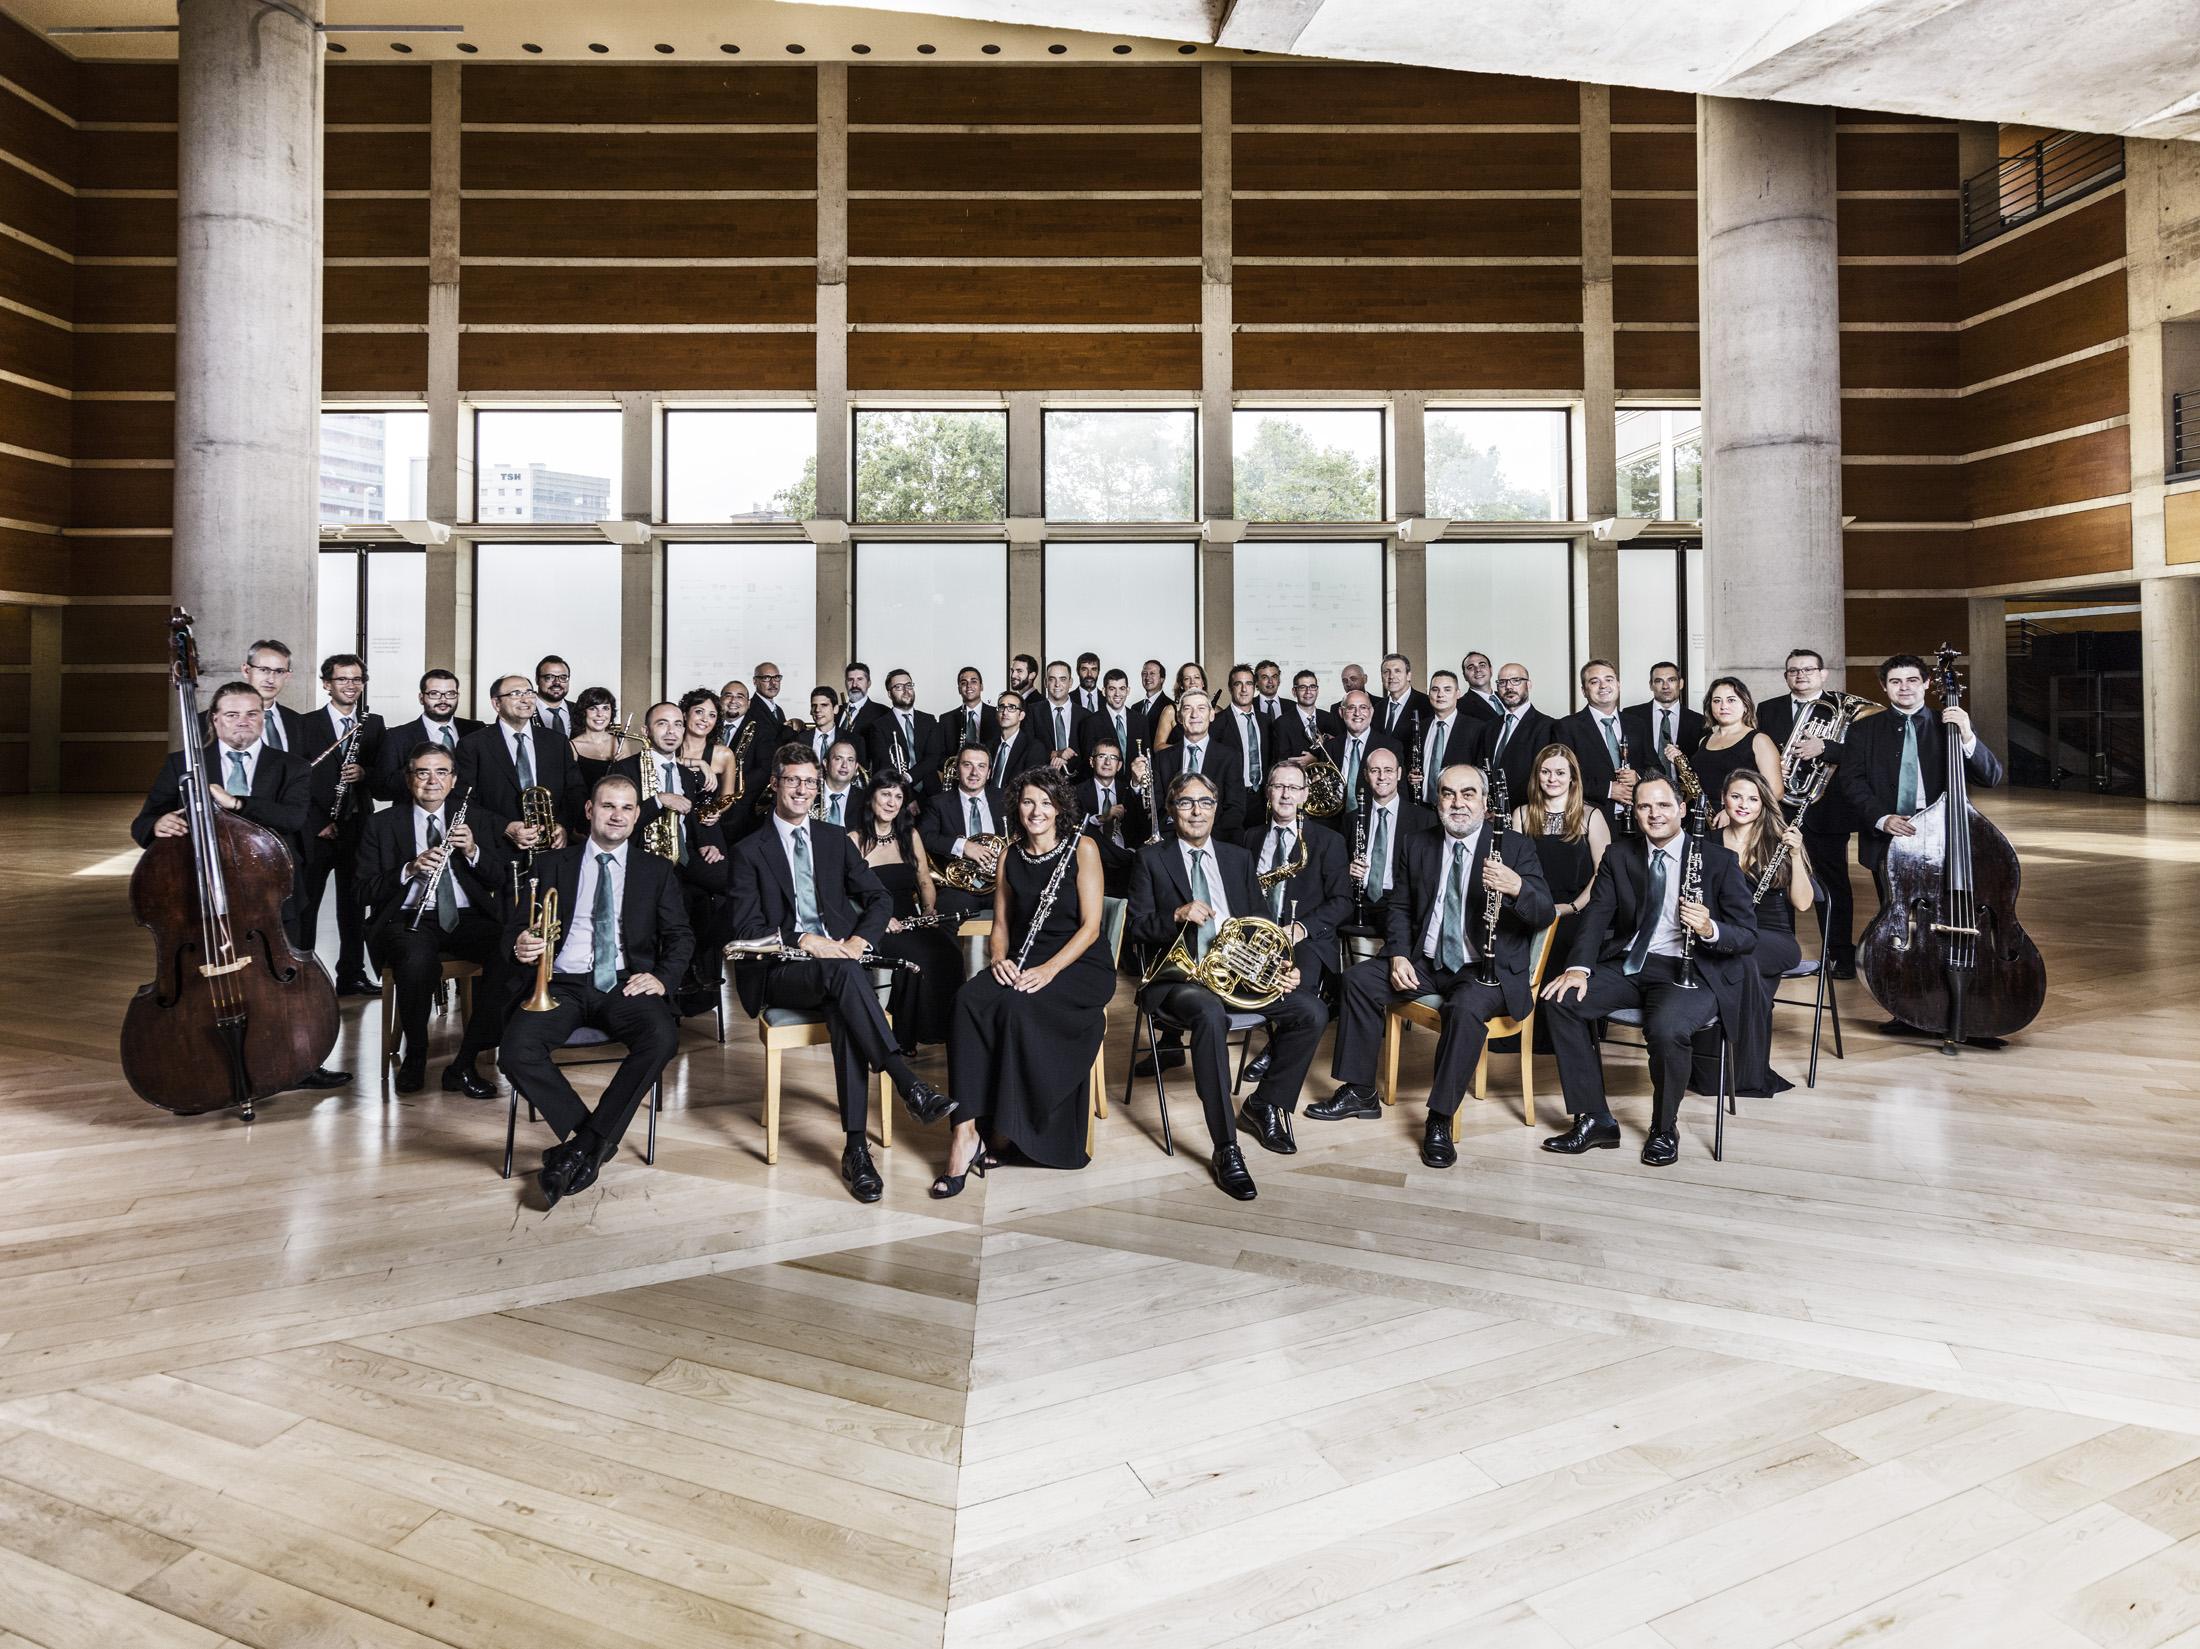 La Banda Municipal de Barcelona, resident a L'Auditori / L'Auditori